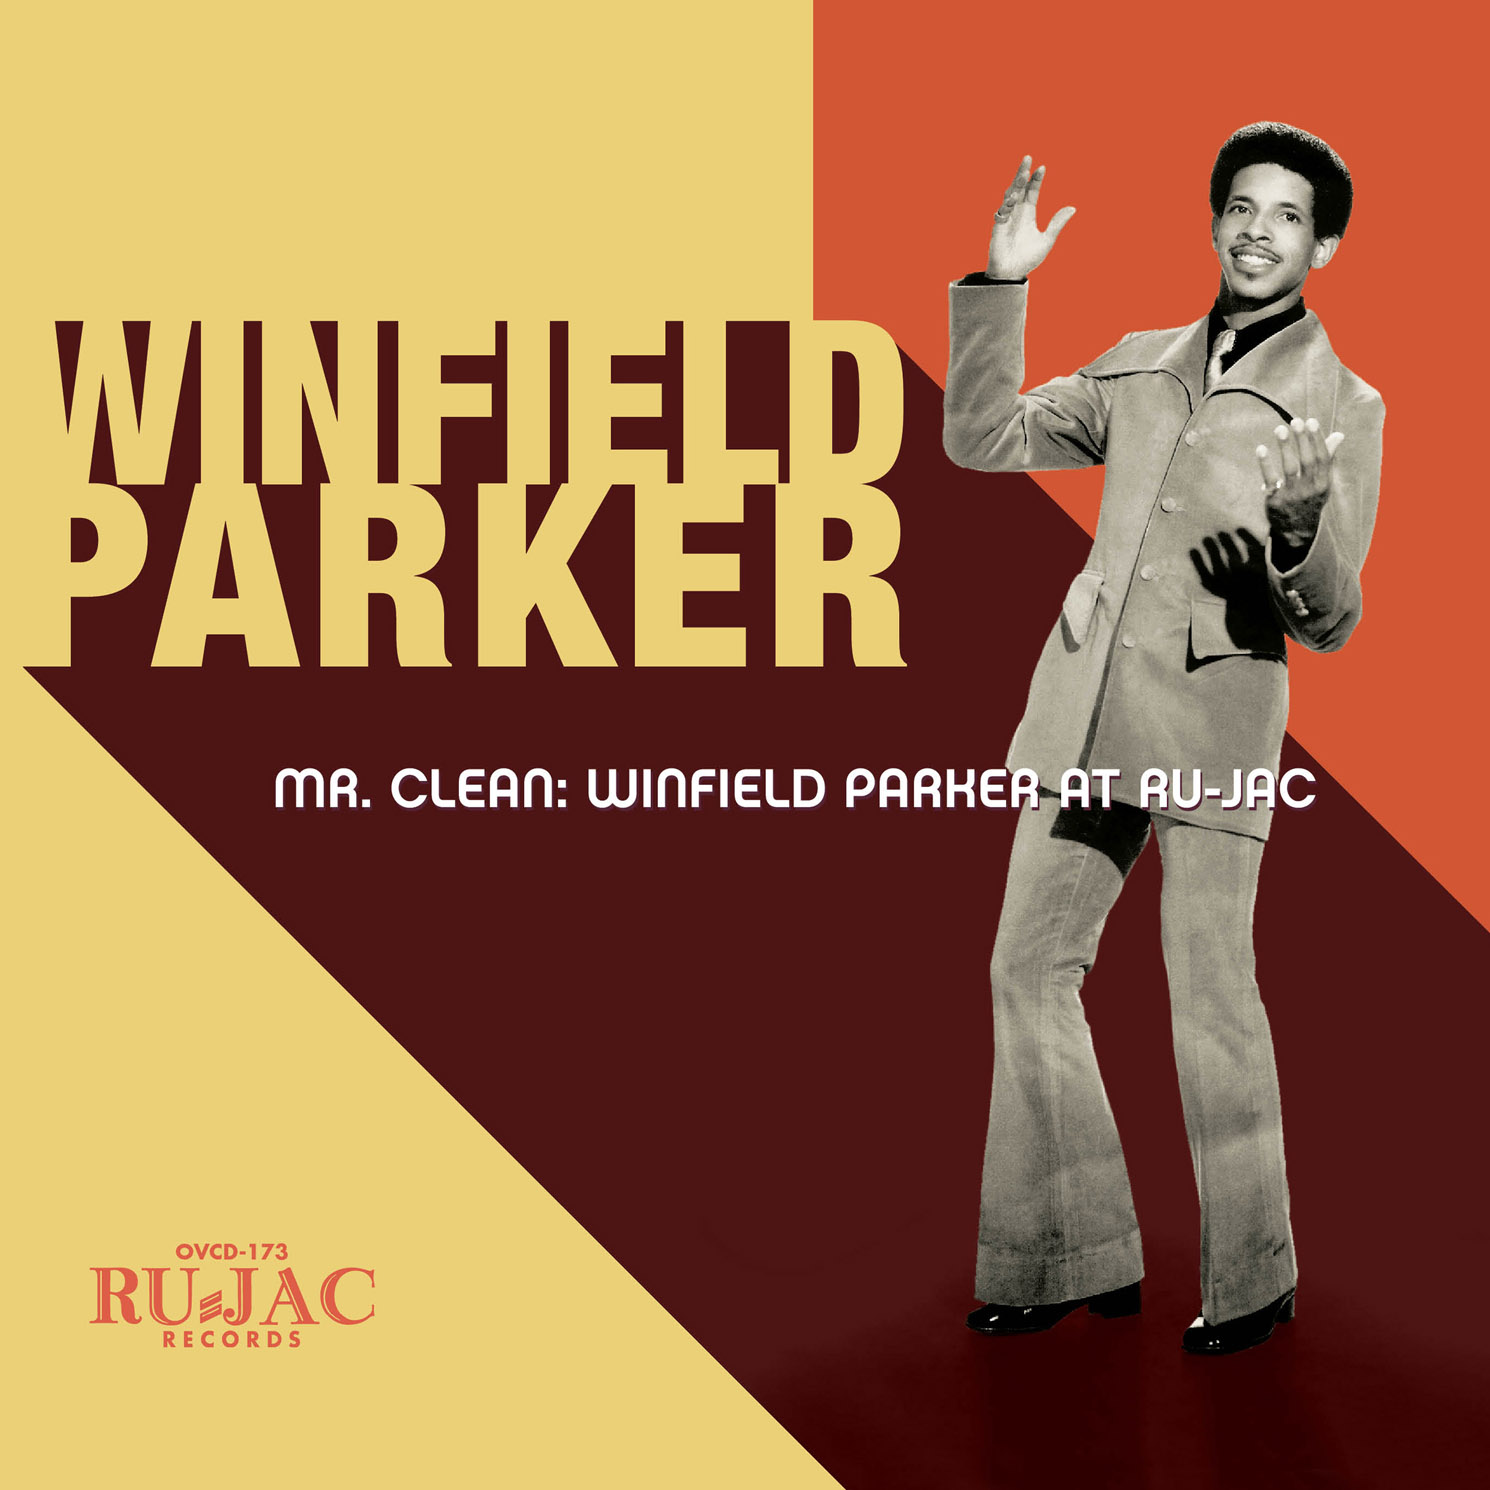 Winfield Parker - Mr. Clean: Winfield Parker at Ru-Jac  Release Date: March 25, 2016 Label: Omnivore Recordings  SERVICE: Restoration, Mastering NUMBER OF DISCS: 1 GENRE: Soul FORMAT: CD   TRAILER